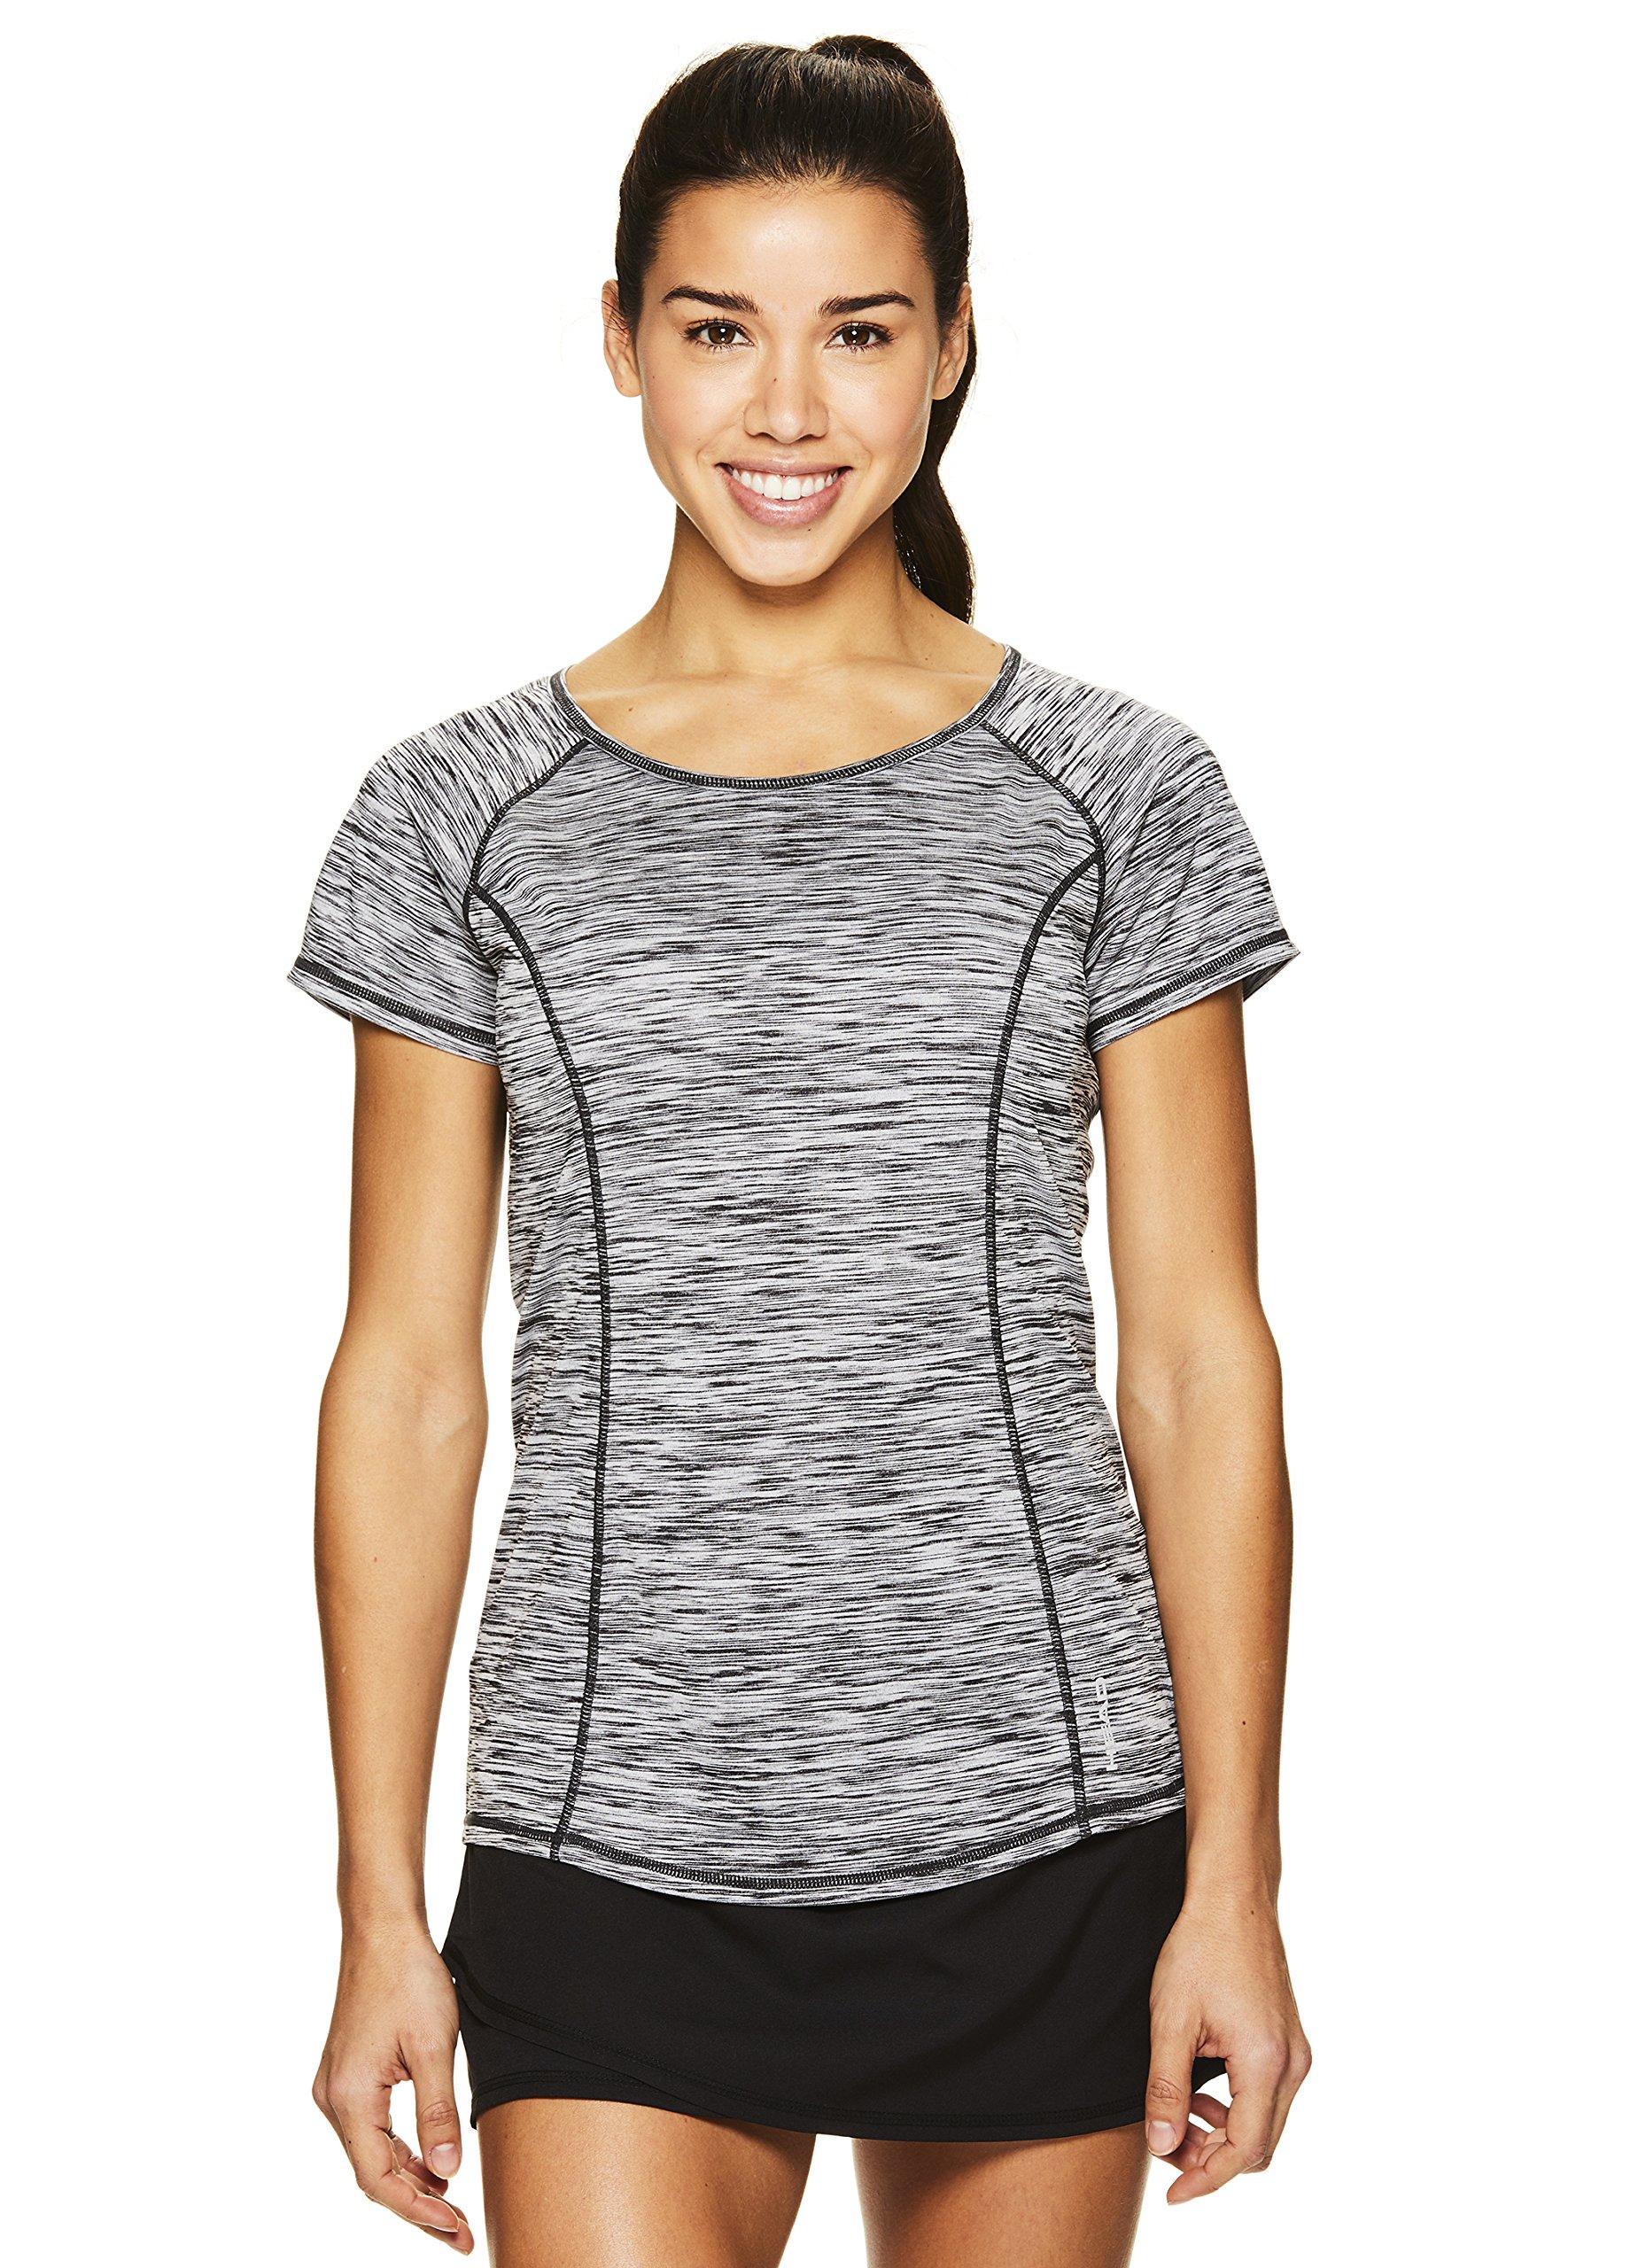 HEAD Women's Serena Short Sleeve Workout T-Shirt - Performance Crew Neck Activewear Top - Black Heather, X-Small